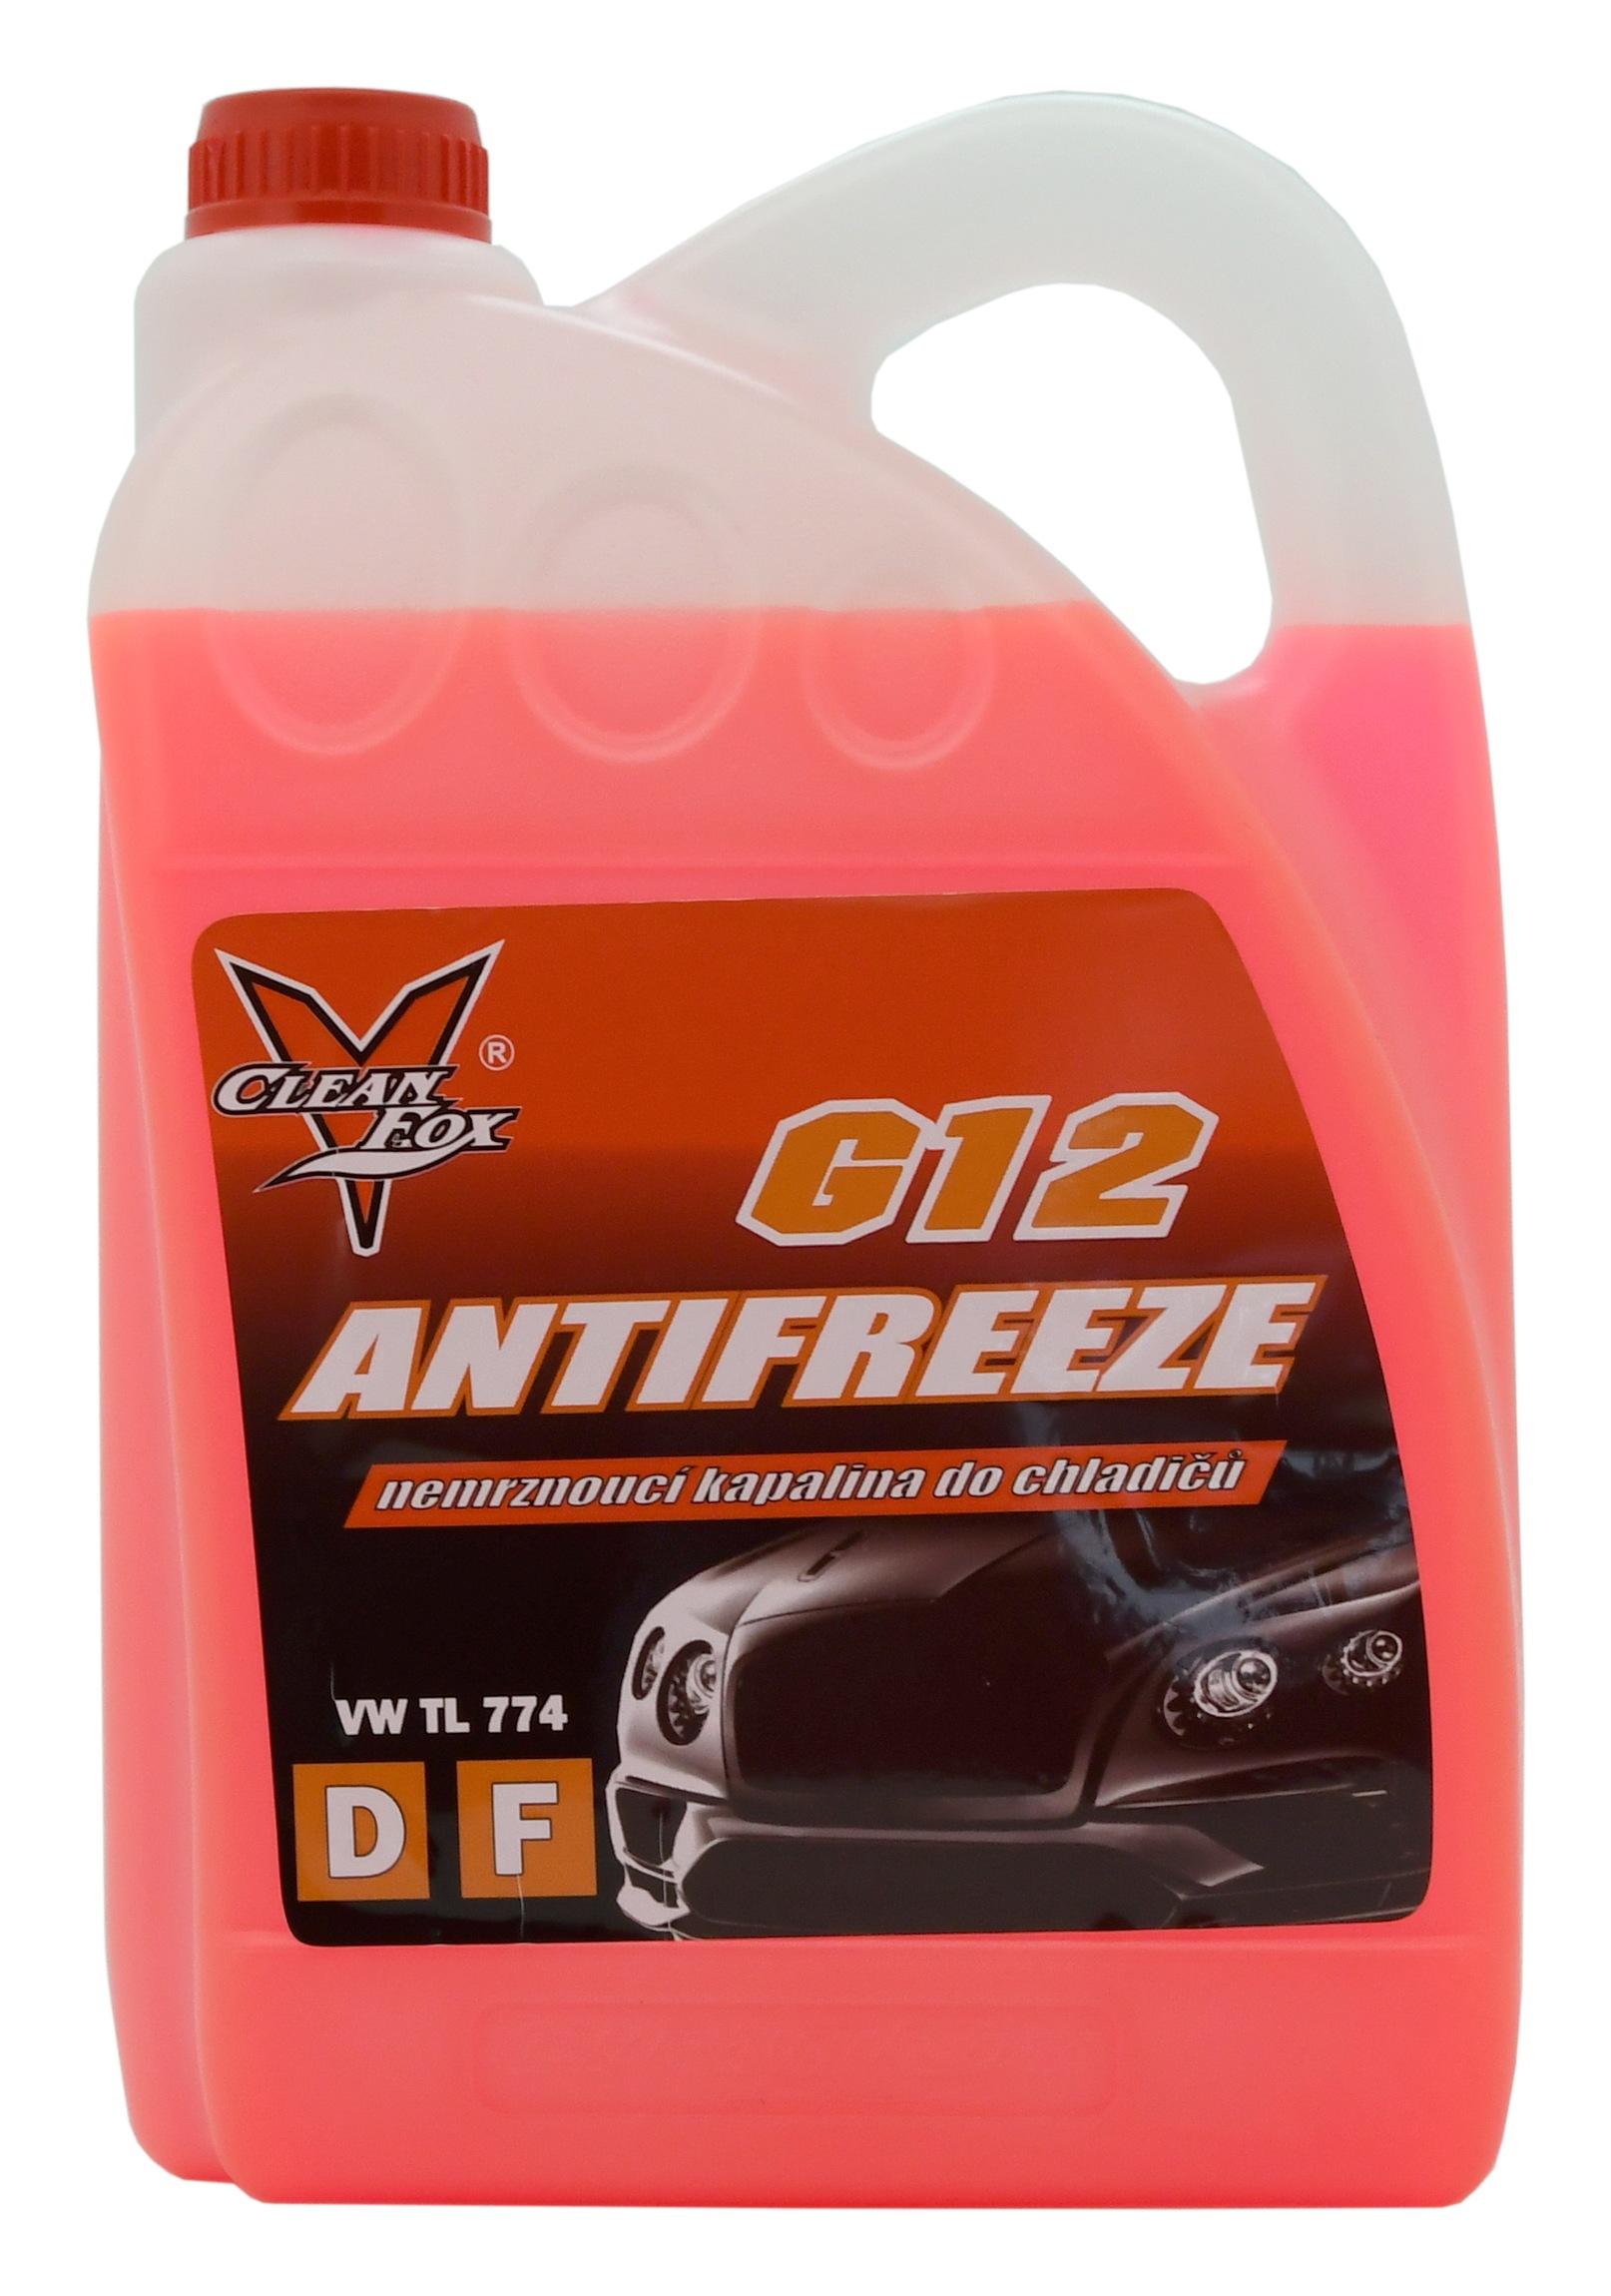 Antifreeze G12, 4 L